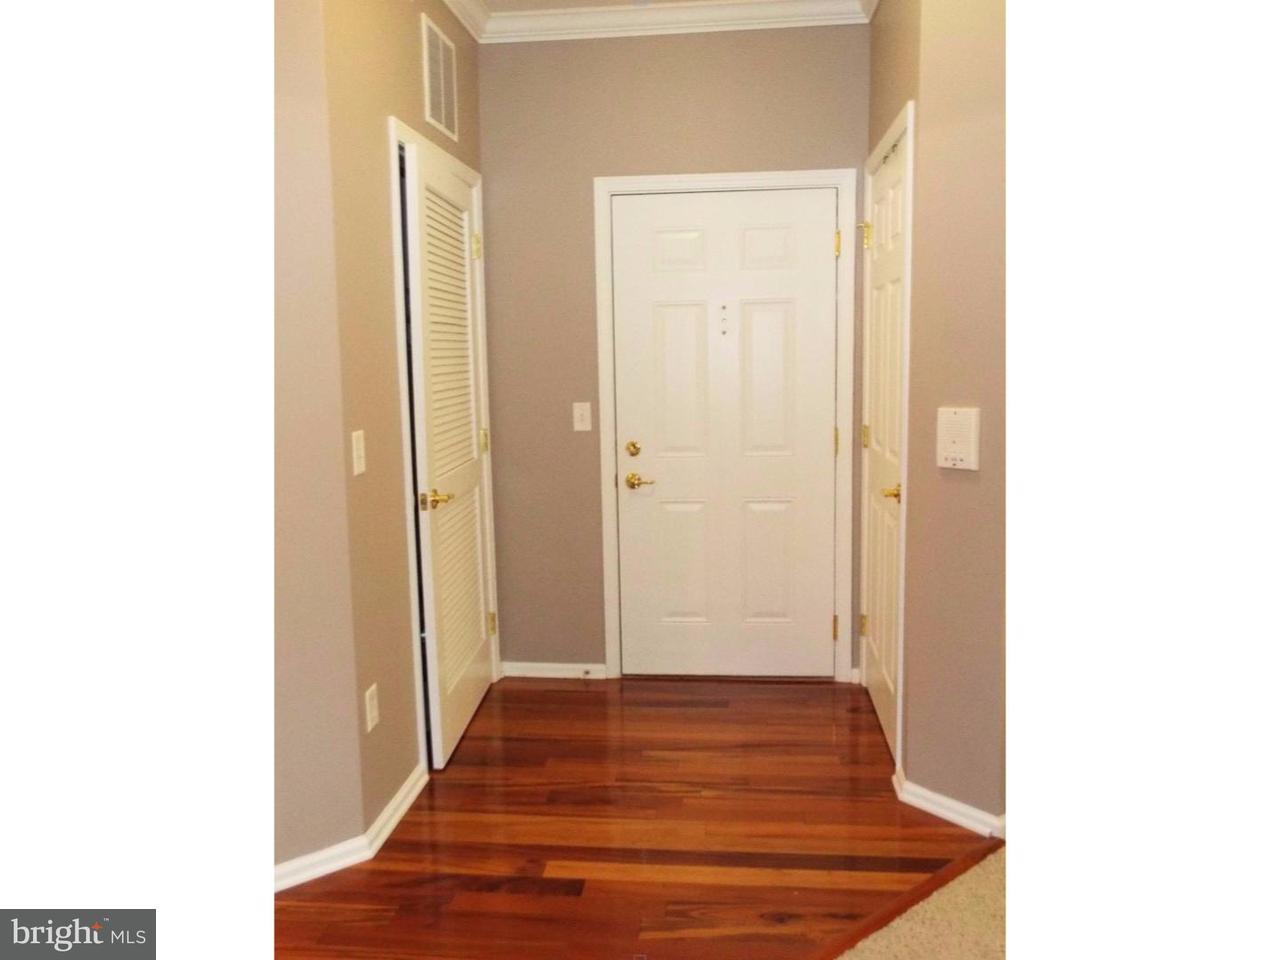 Casa Unifamiliar por un Alquiler en 1036 TIMBERLAKE Drive Ewing Township, Nueva Jersey 08830 Estados UnidosEn/Alrededor: Ewing Township